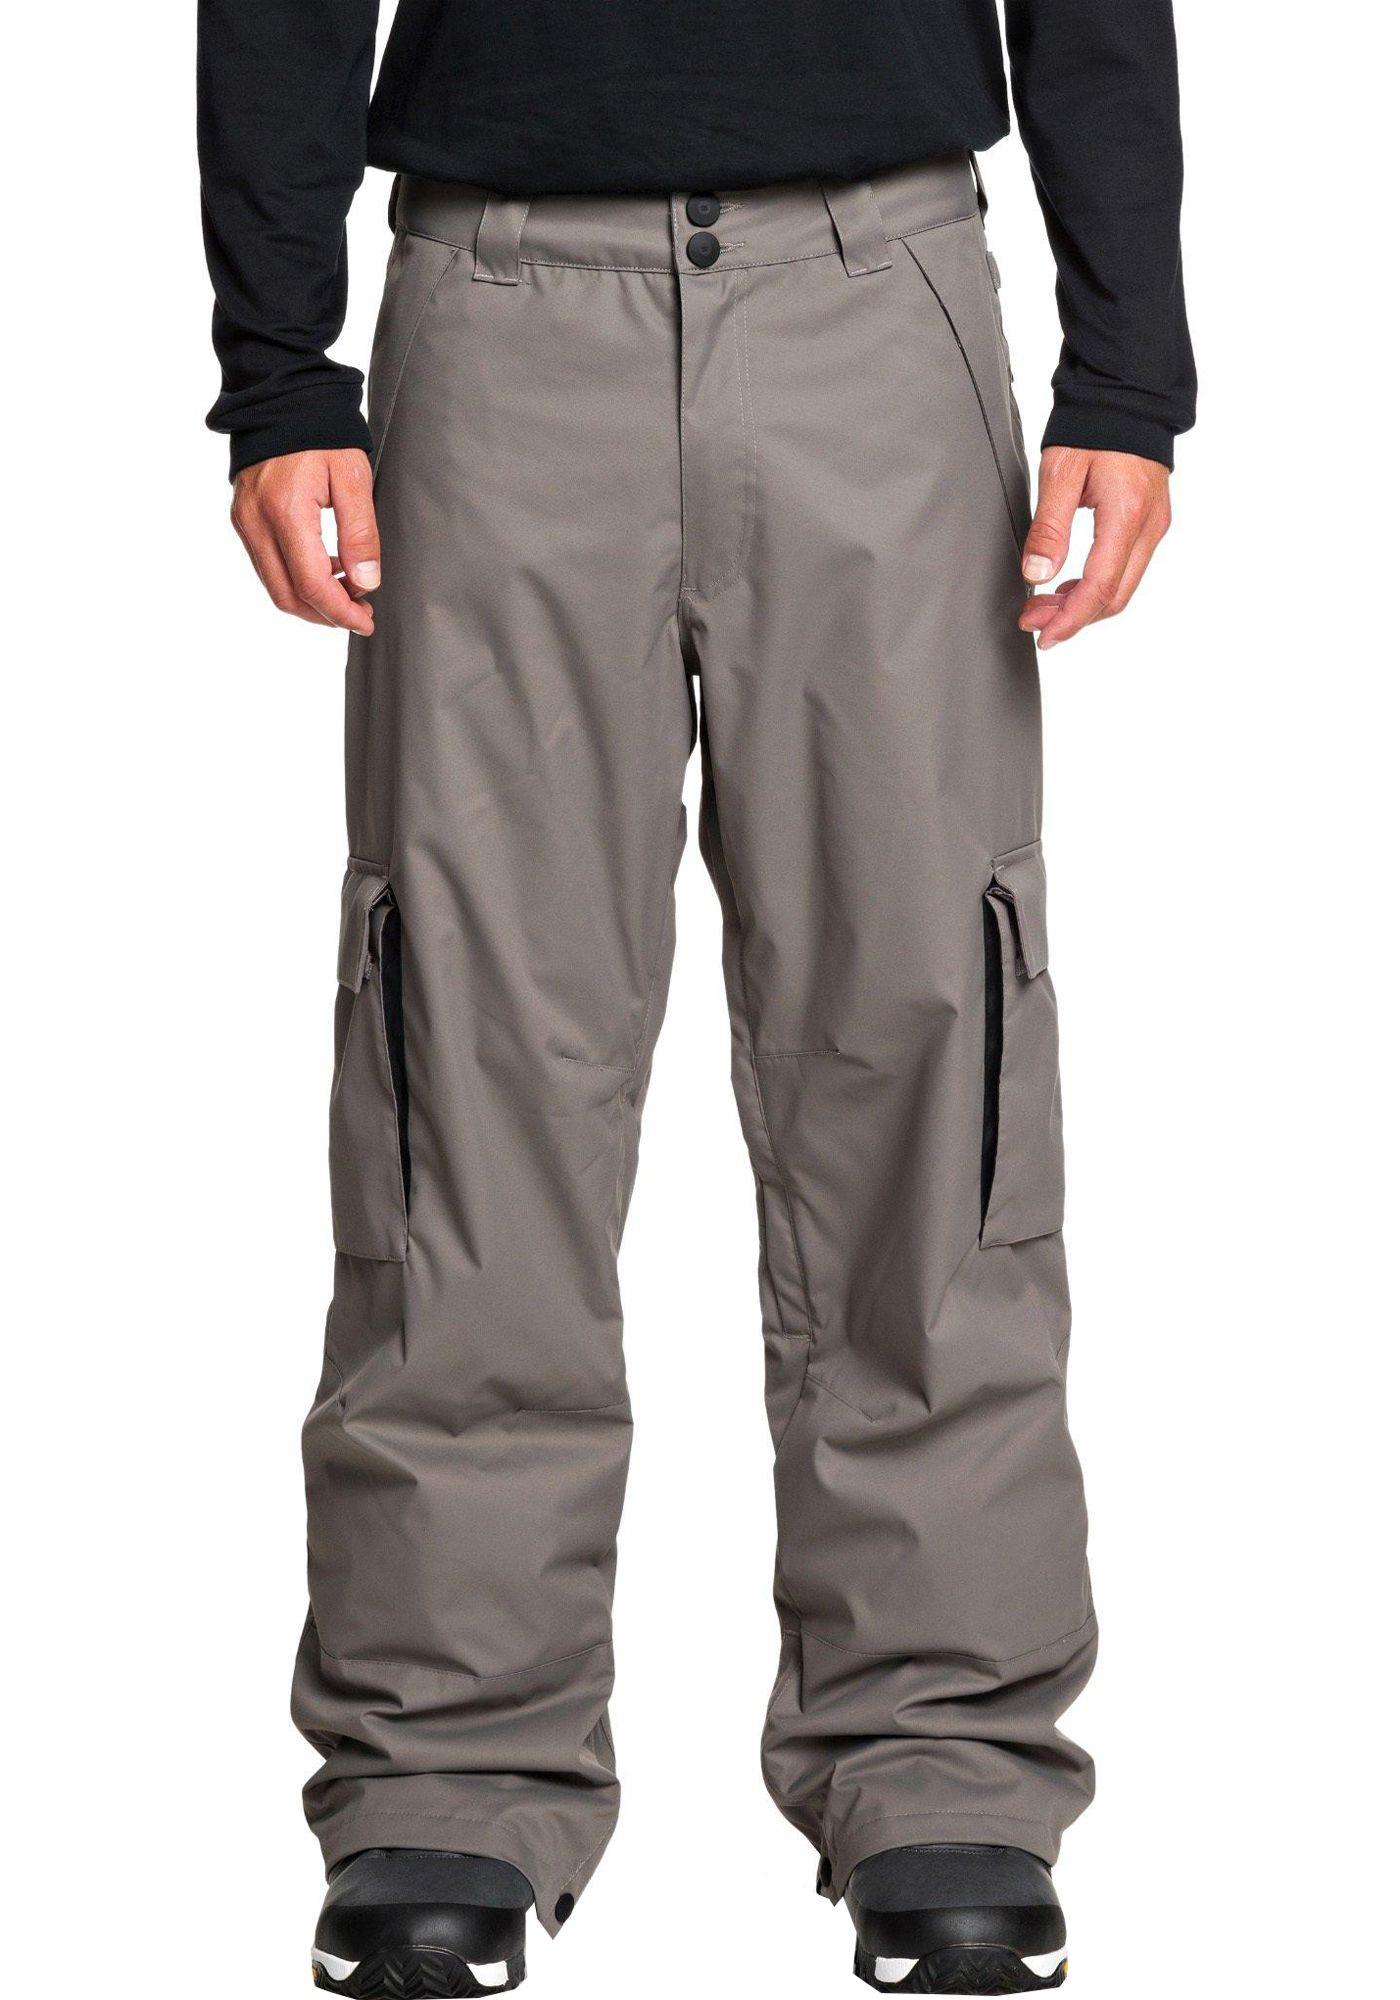 DC Shoes Men's Banshee Insulated Snow Pants